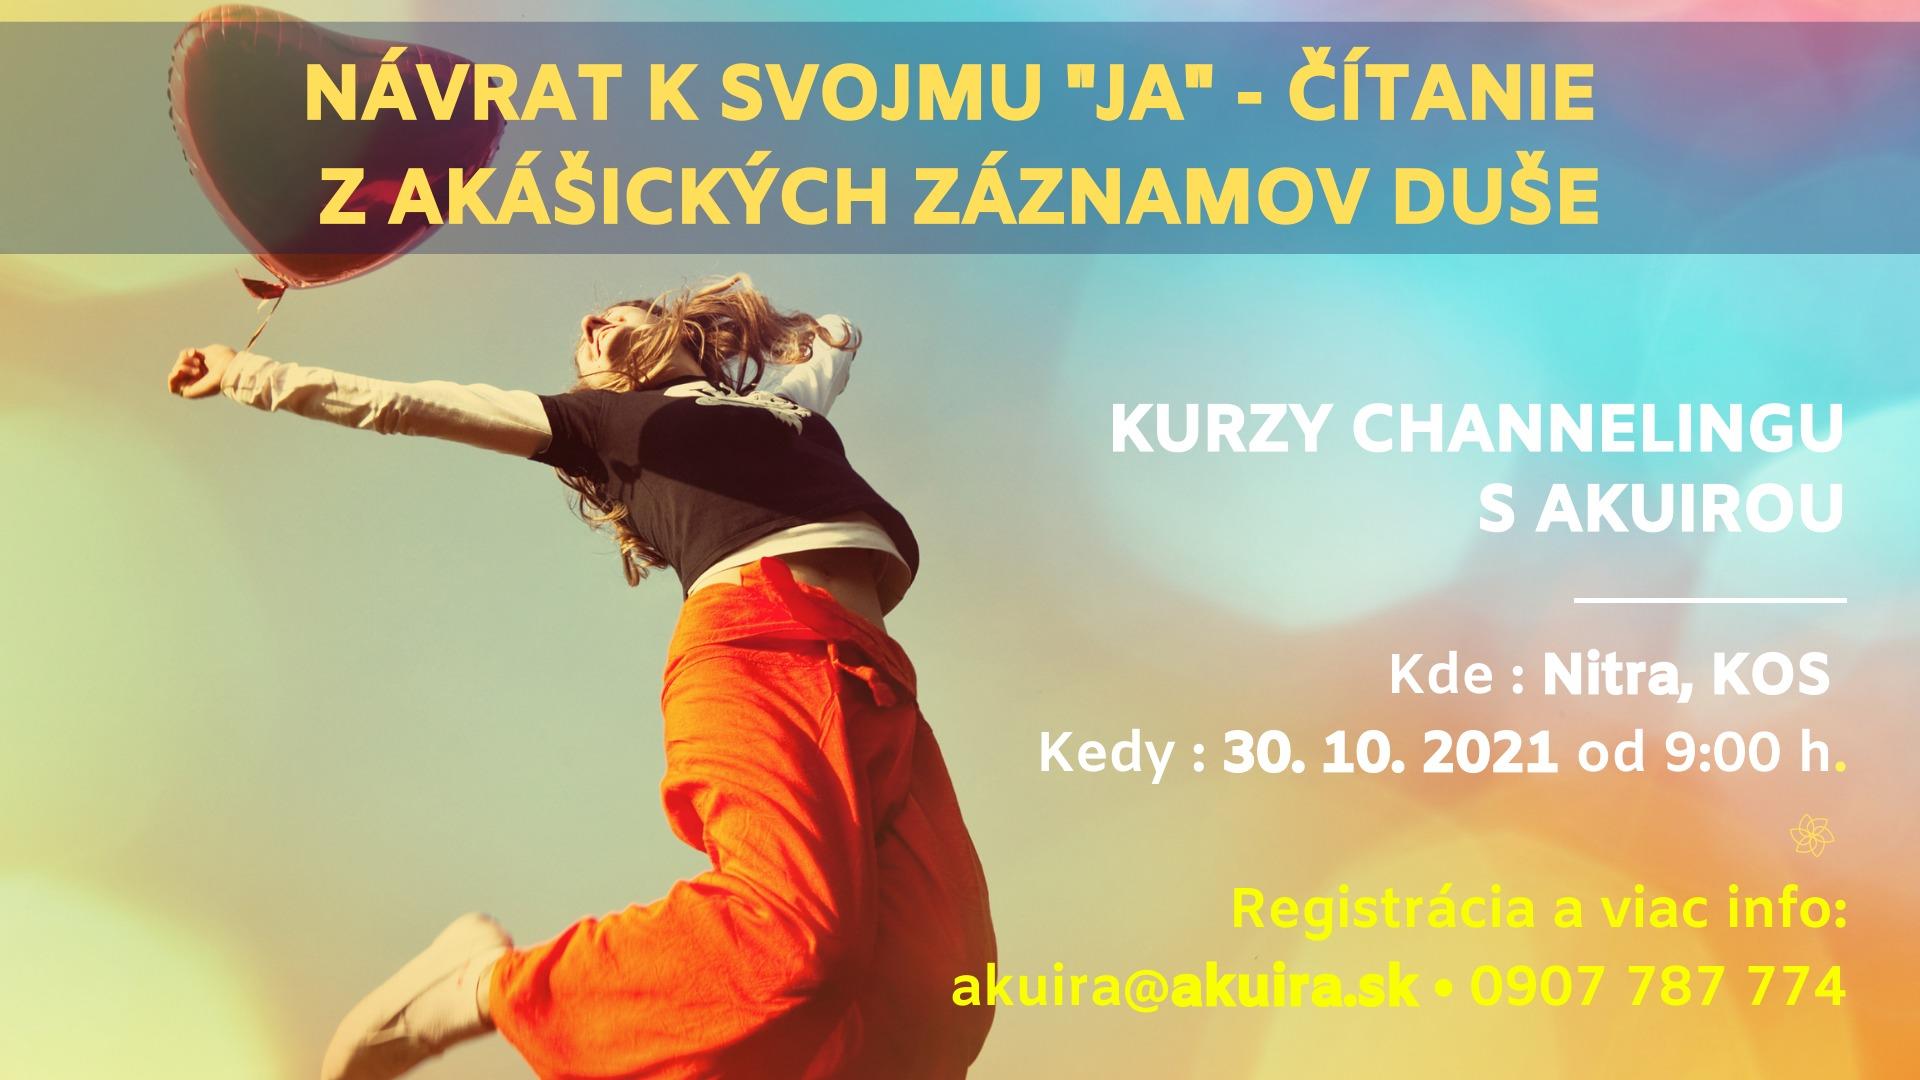 Kurz channeling 30 oktober 2021 Nitra